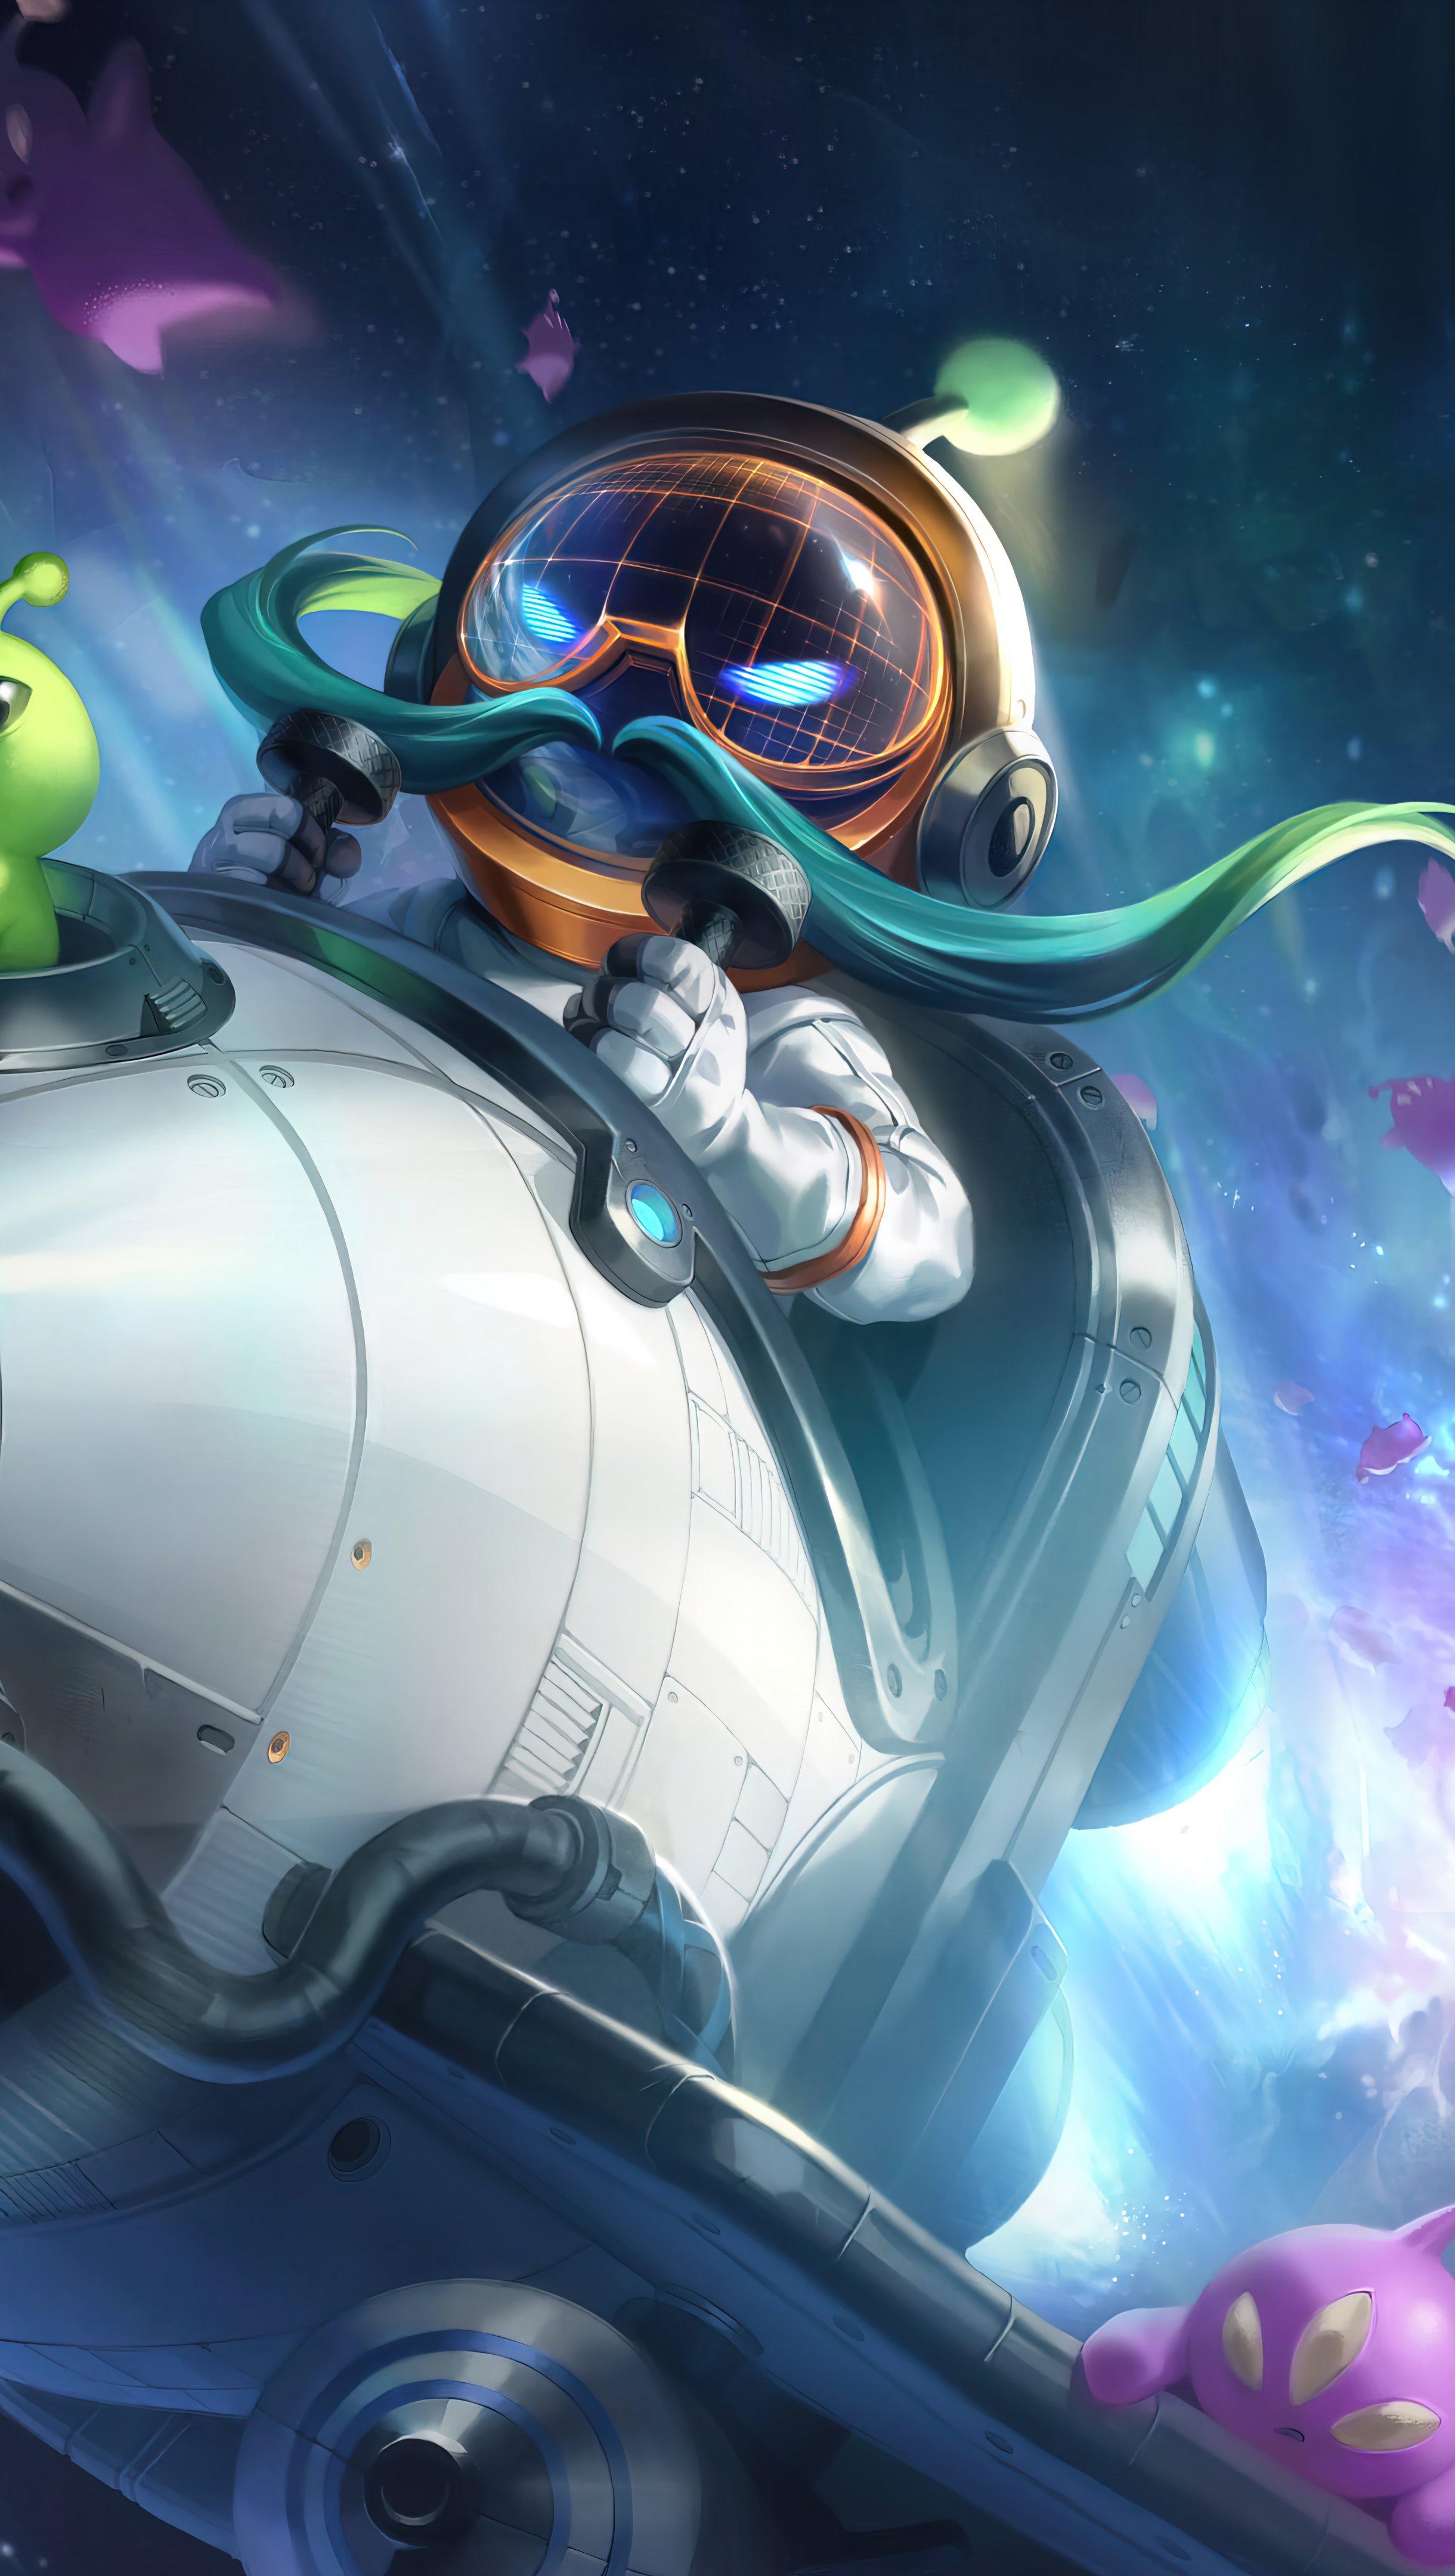 Fondos de pantalla Astronauta Corki League of Legends Splash Art Vertical